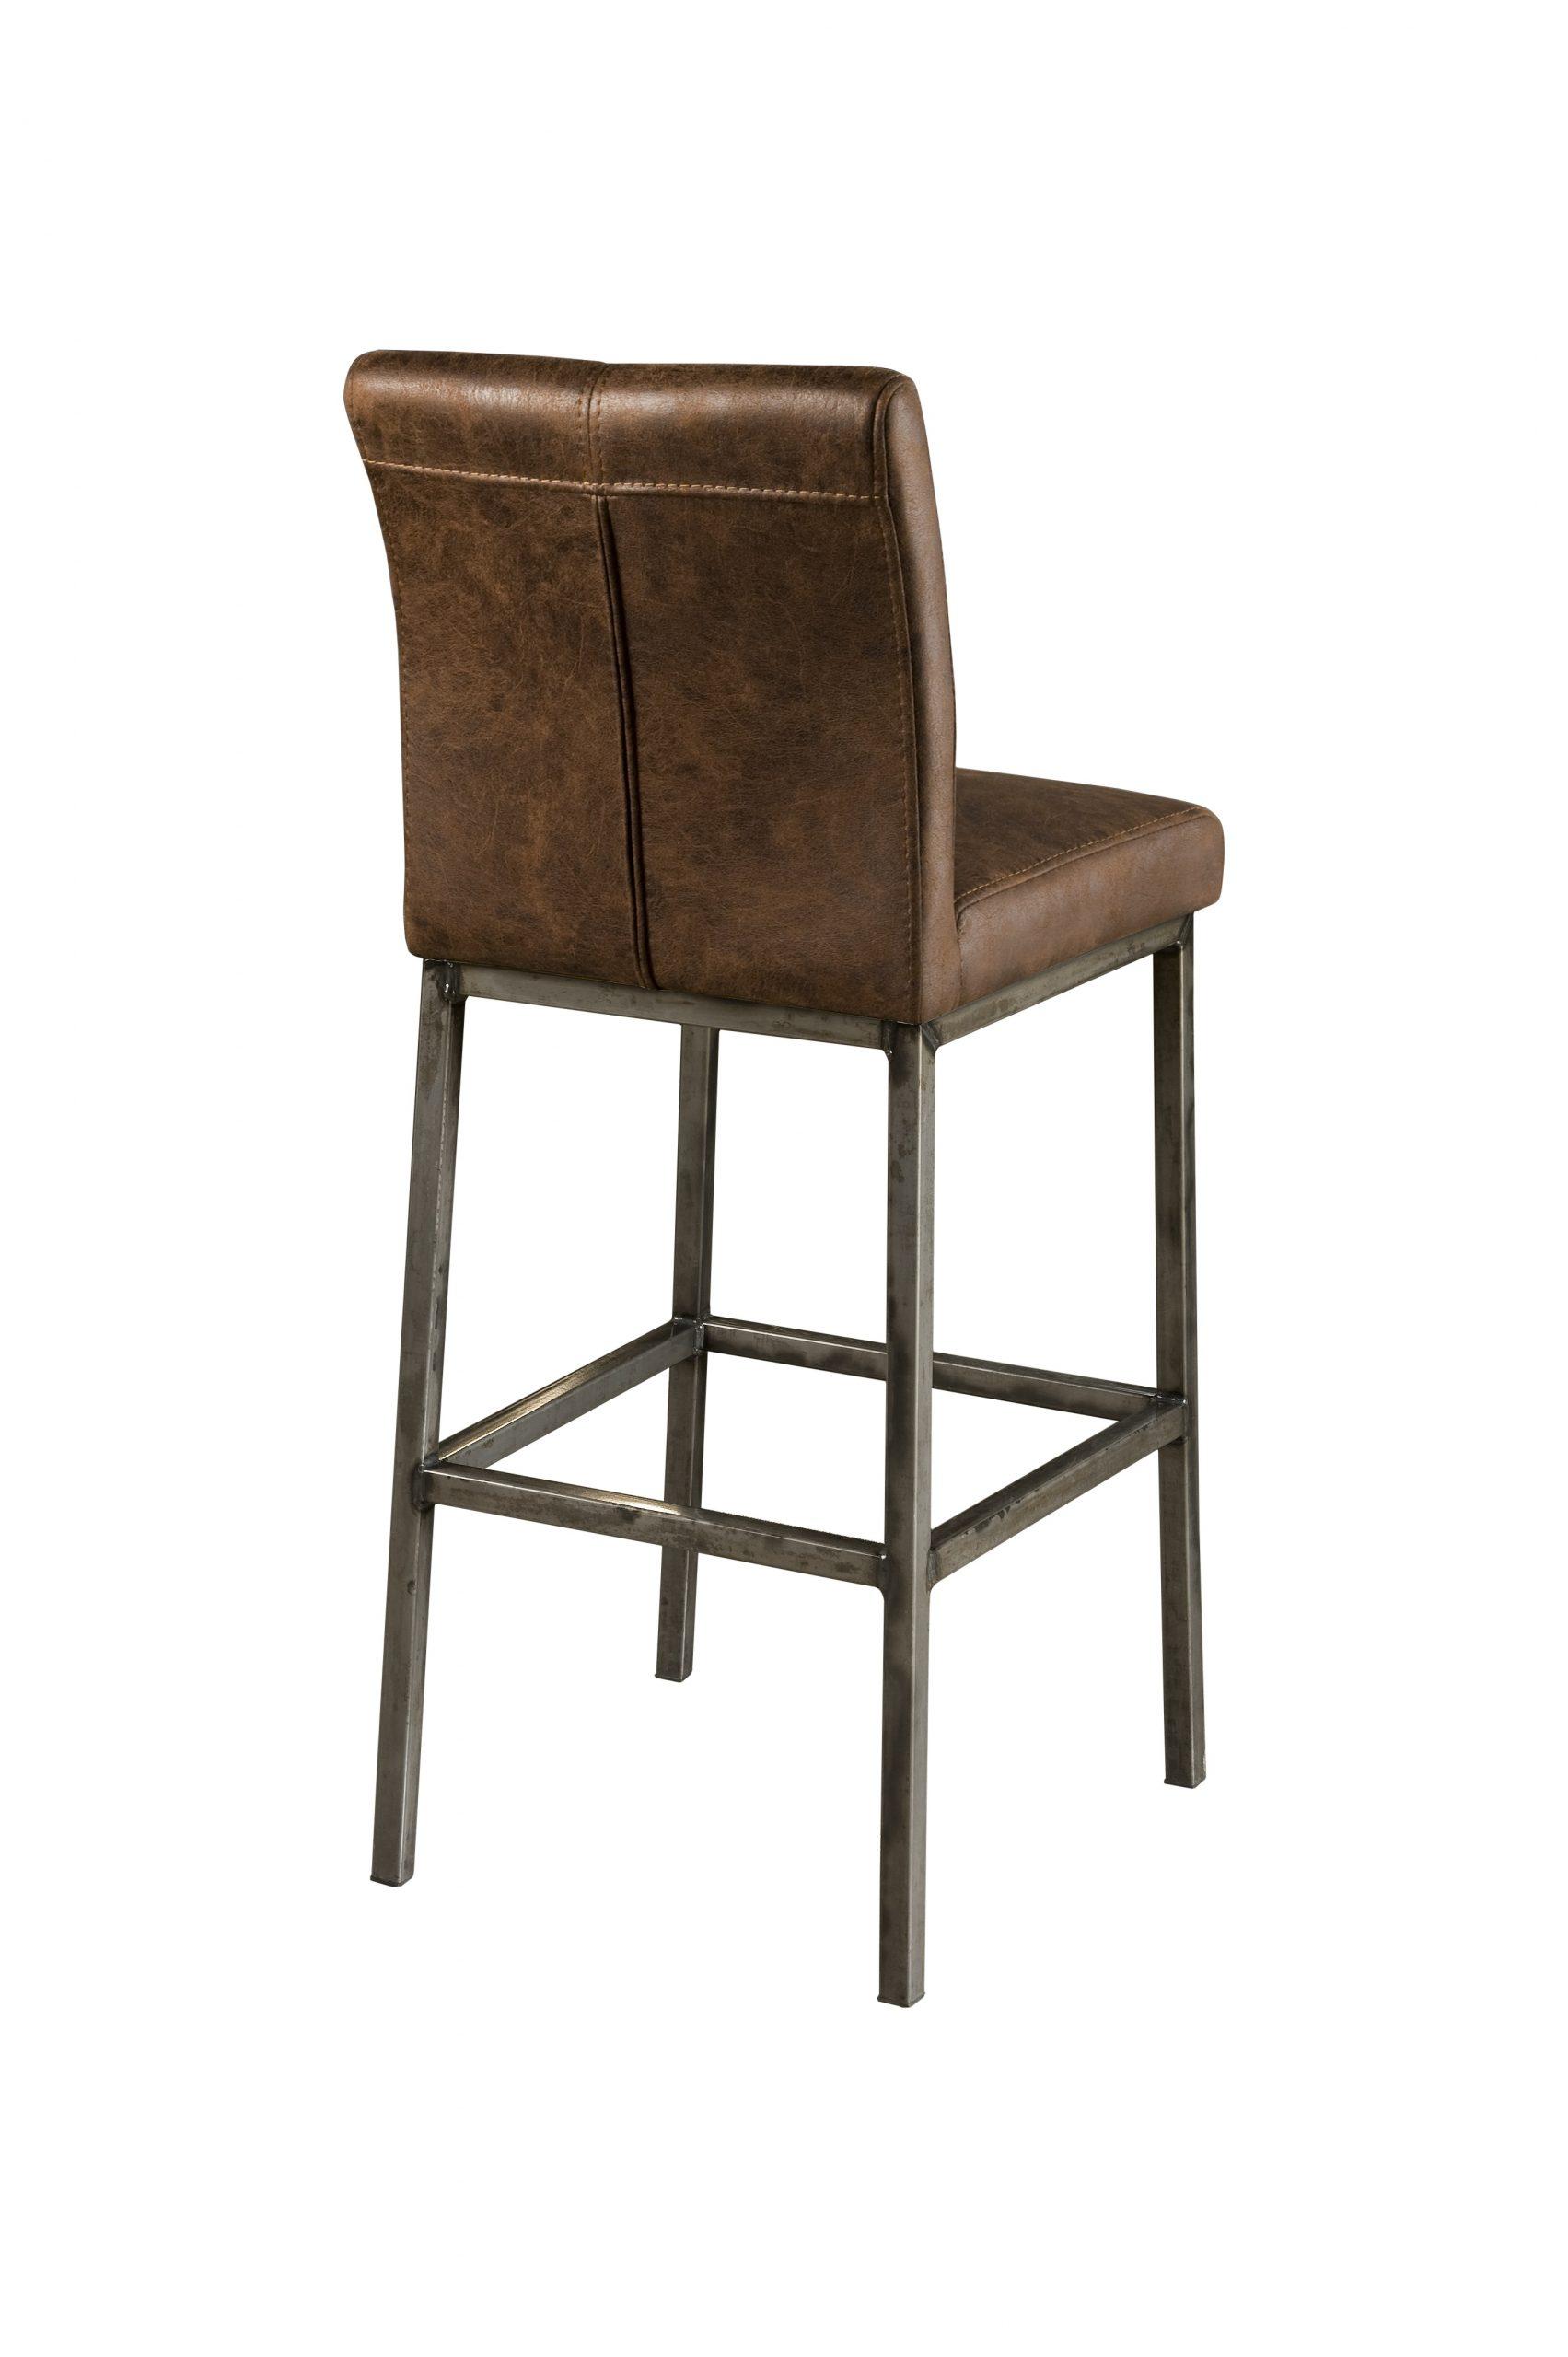 NC 0052 - Sevilla barstool - fabric dark brown (A)